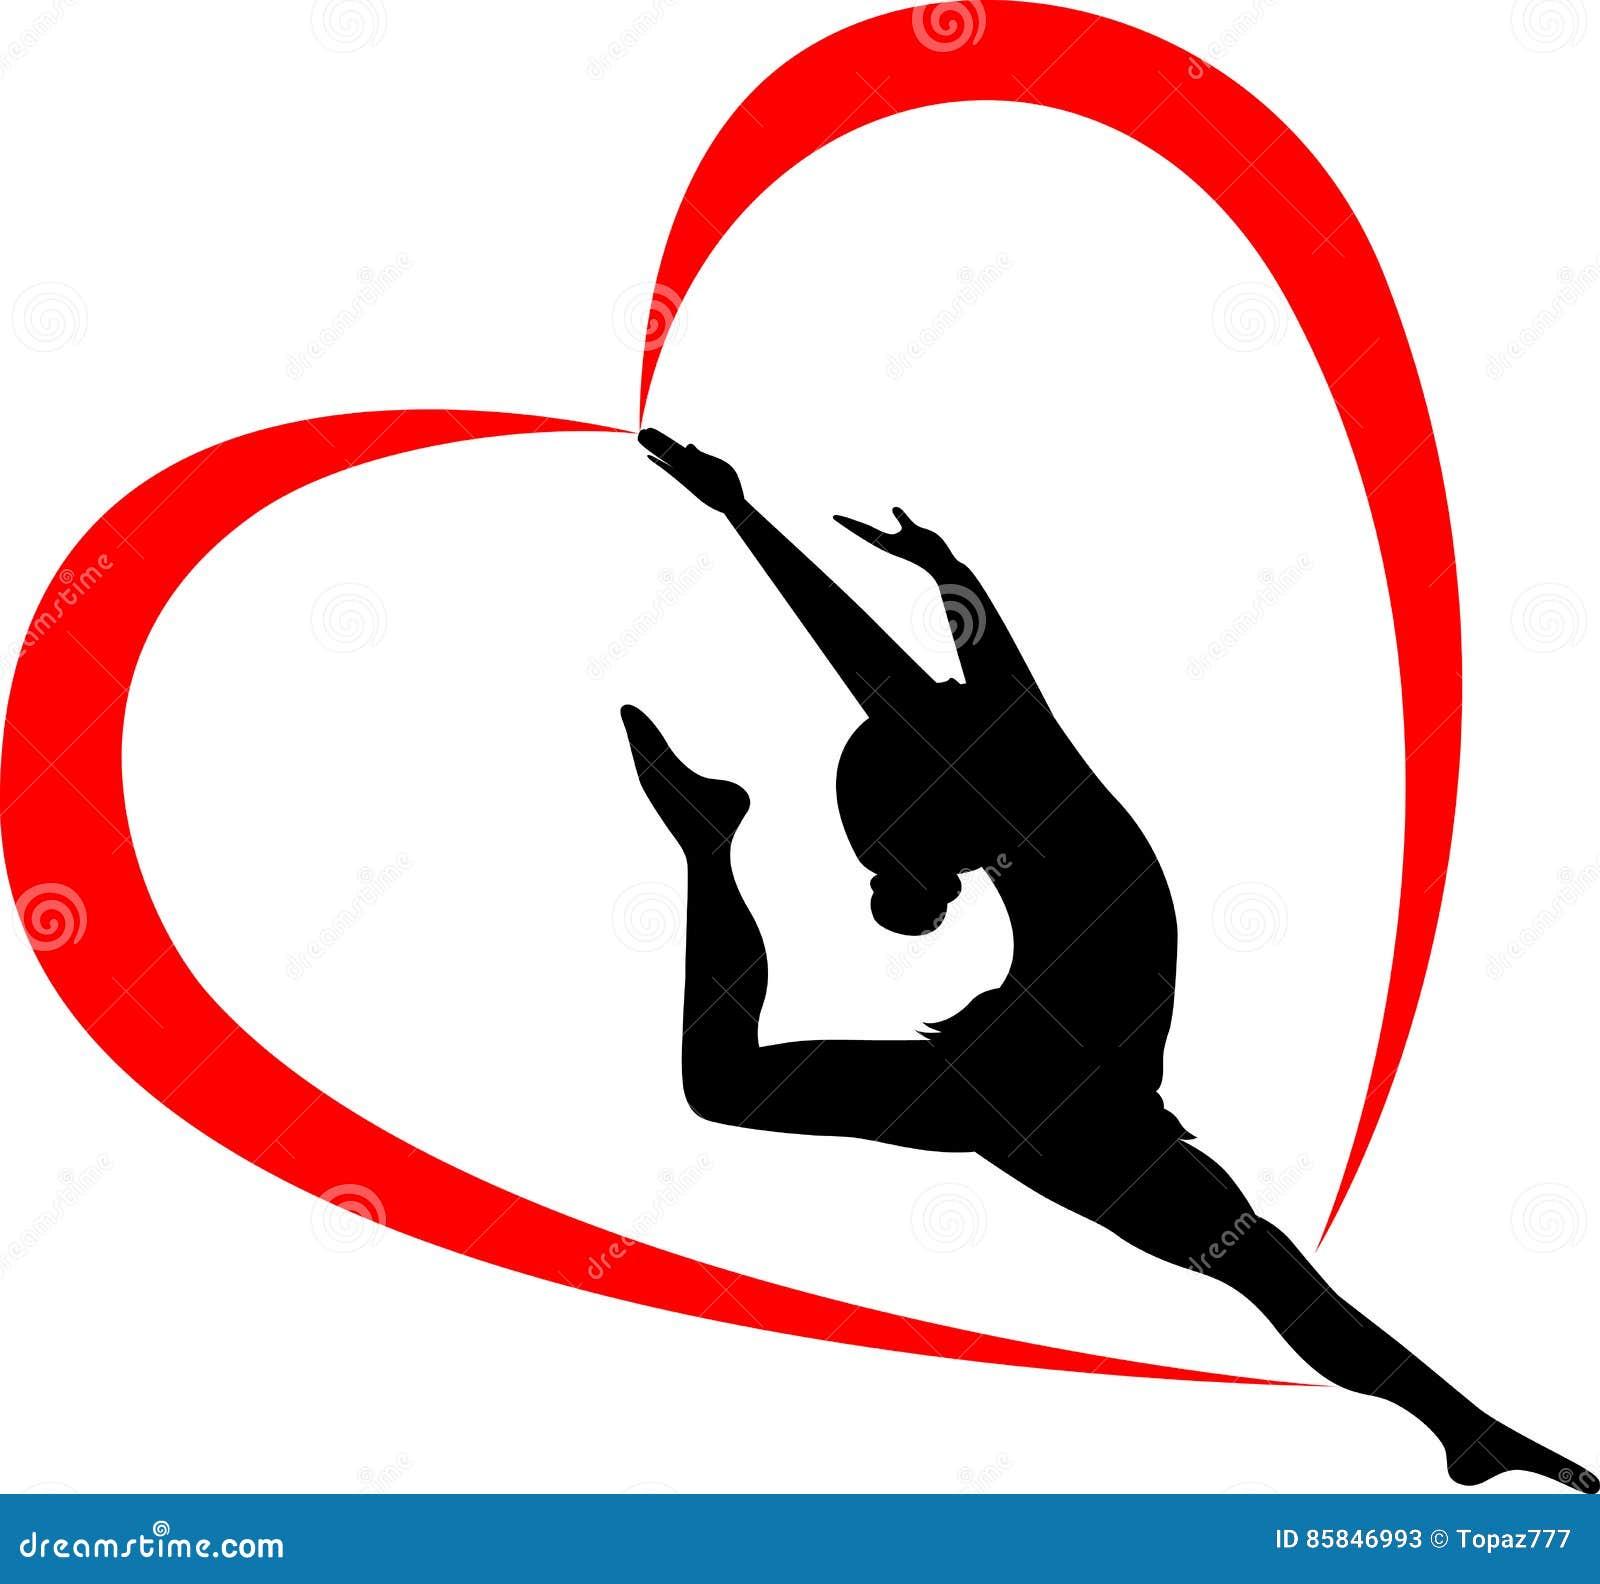 Gymnastics logo. gymnast athlete.